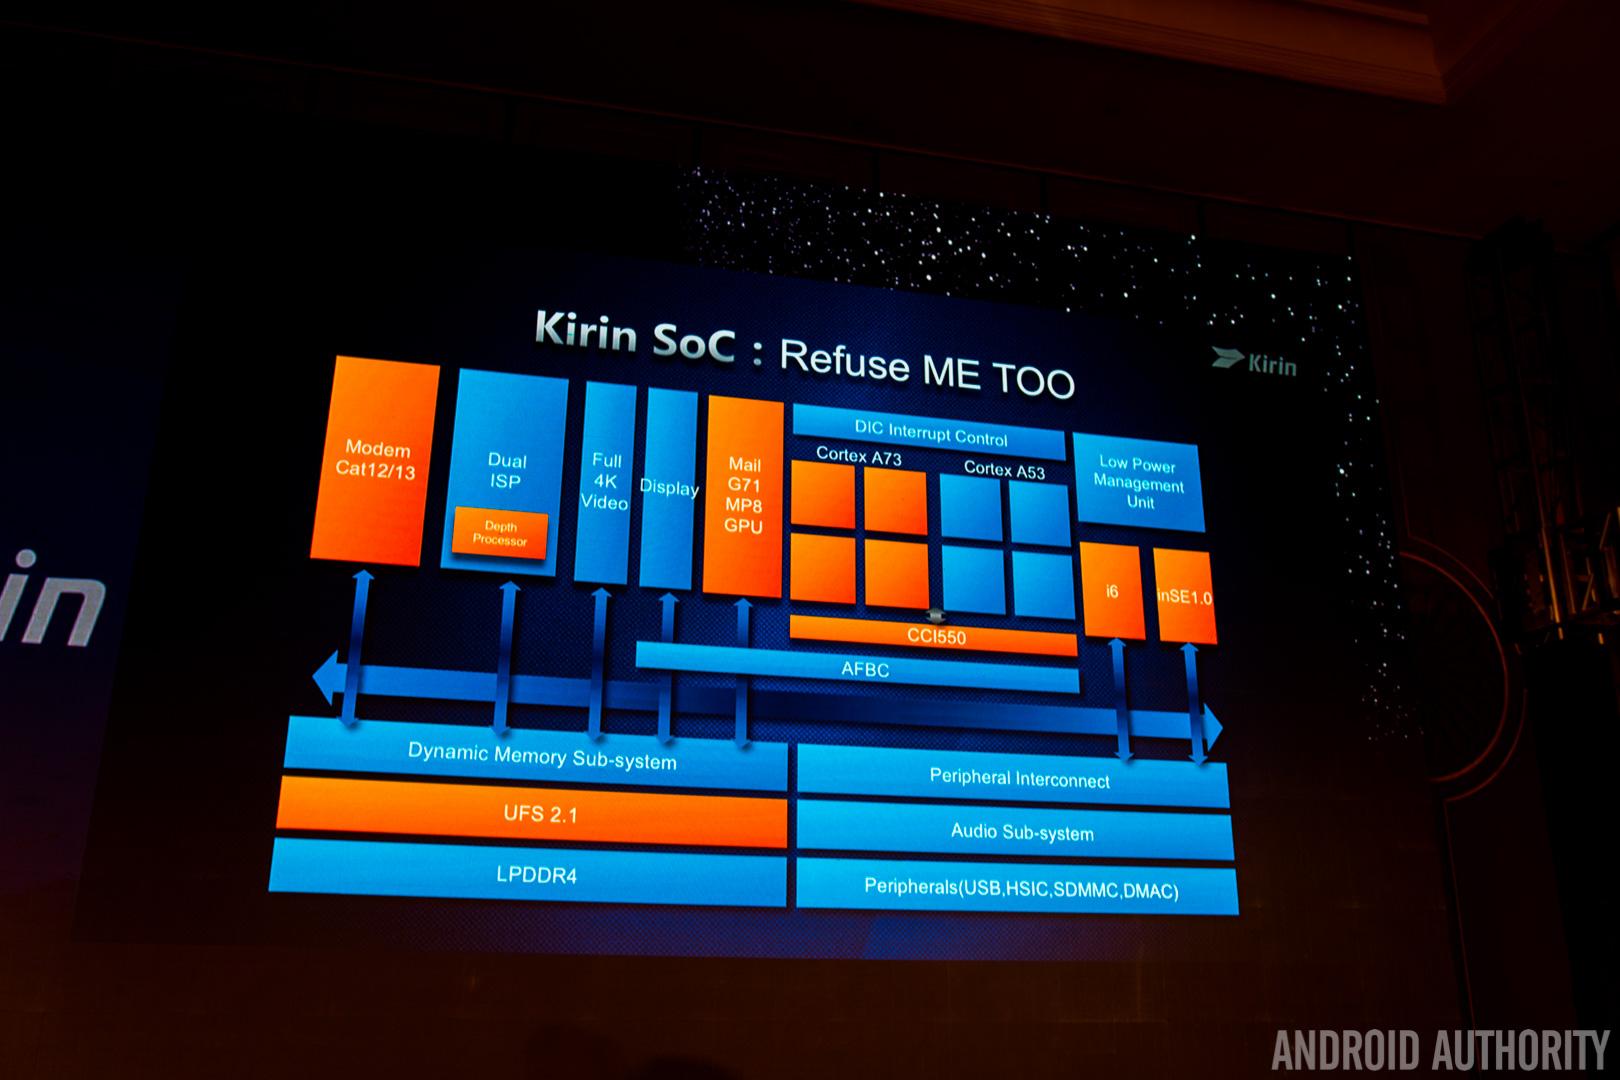 kirin-960-new-features-overview